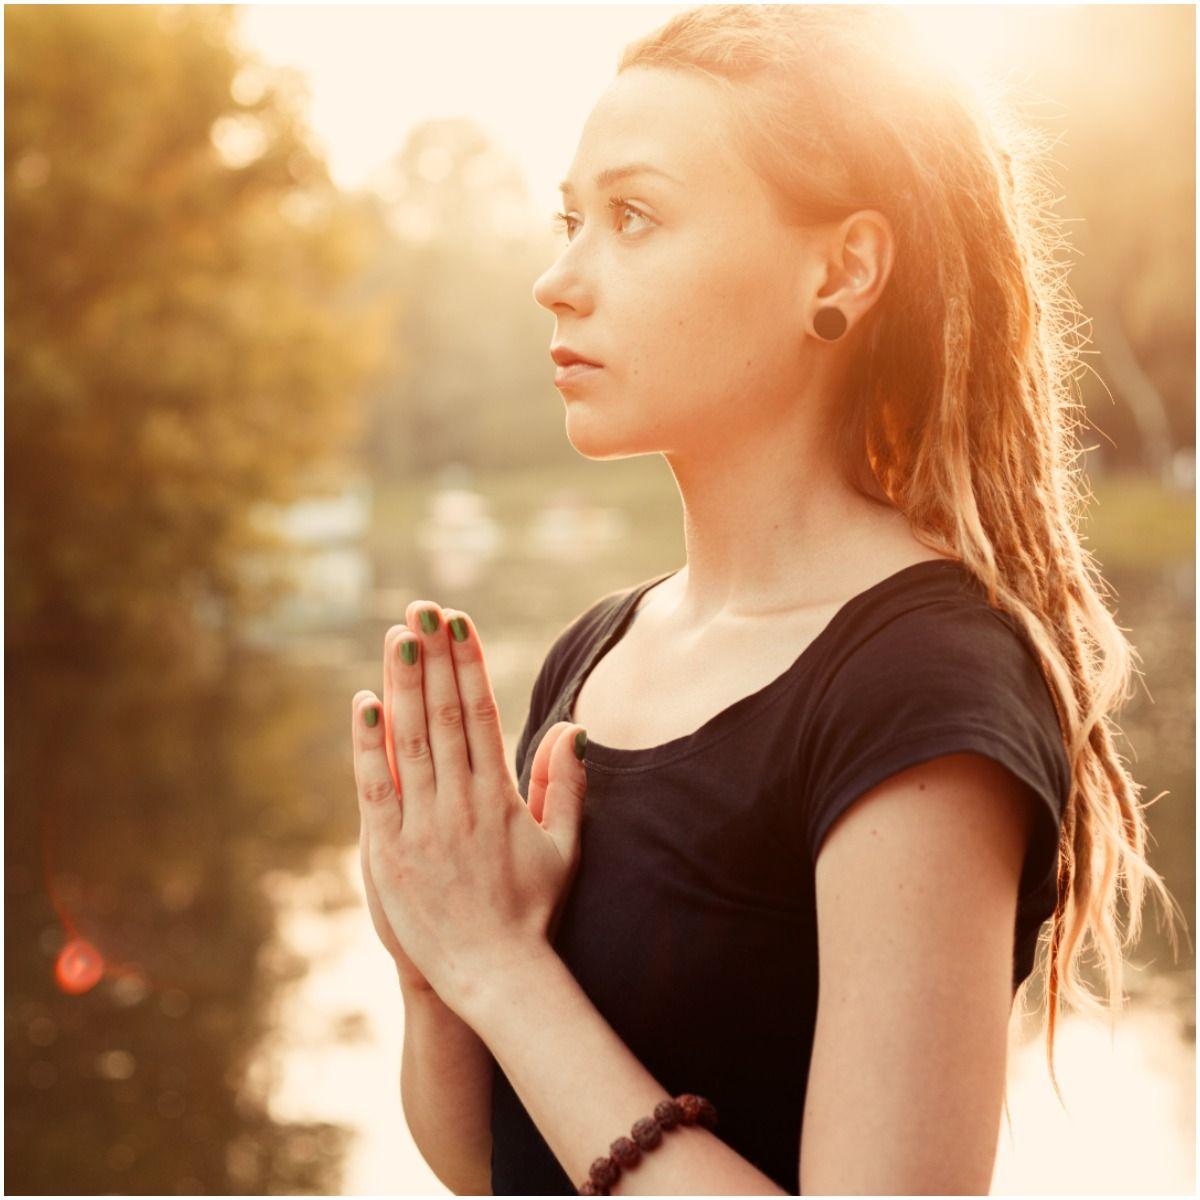 meditation woman third eye pray